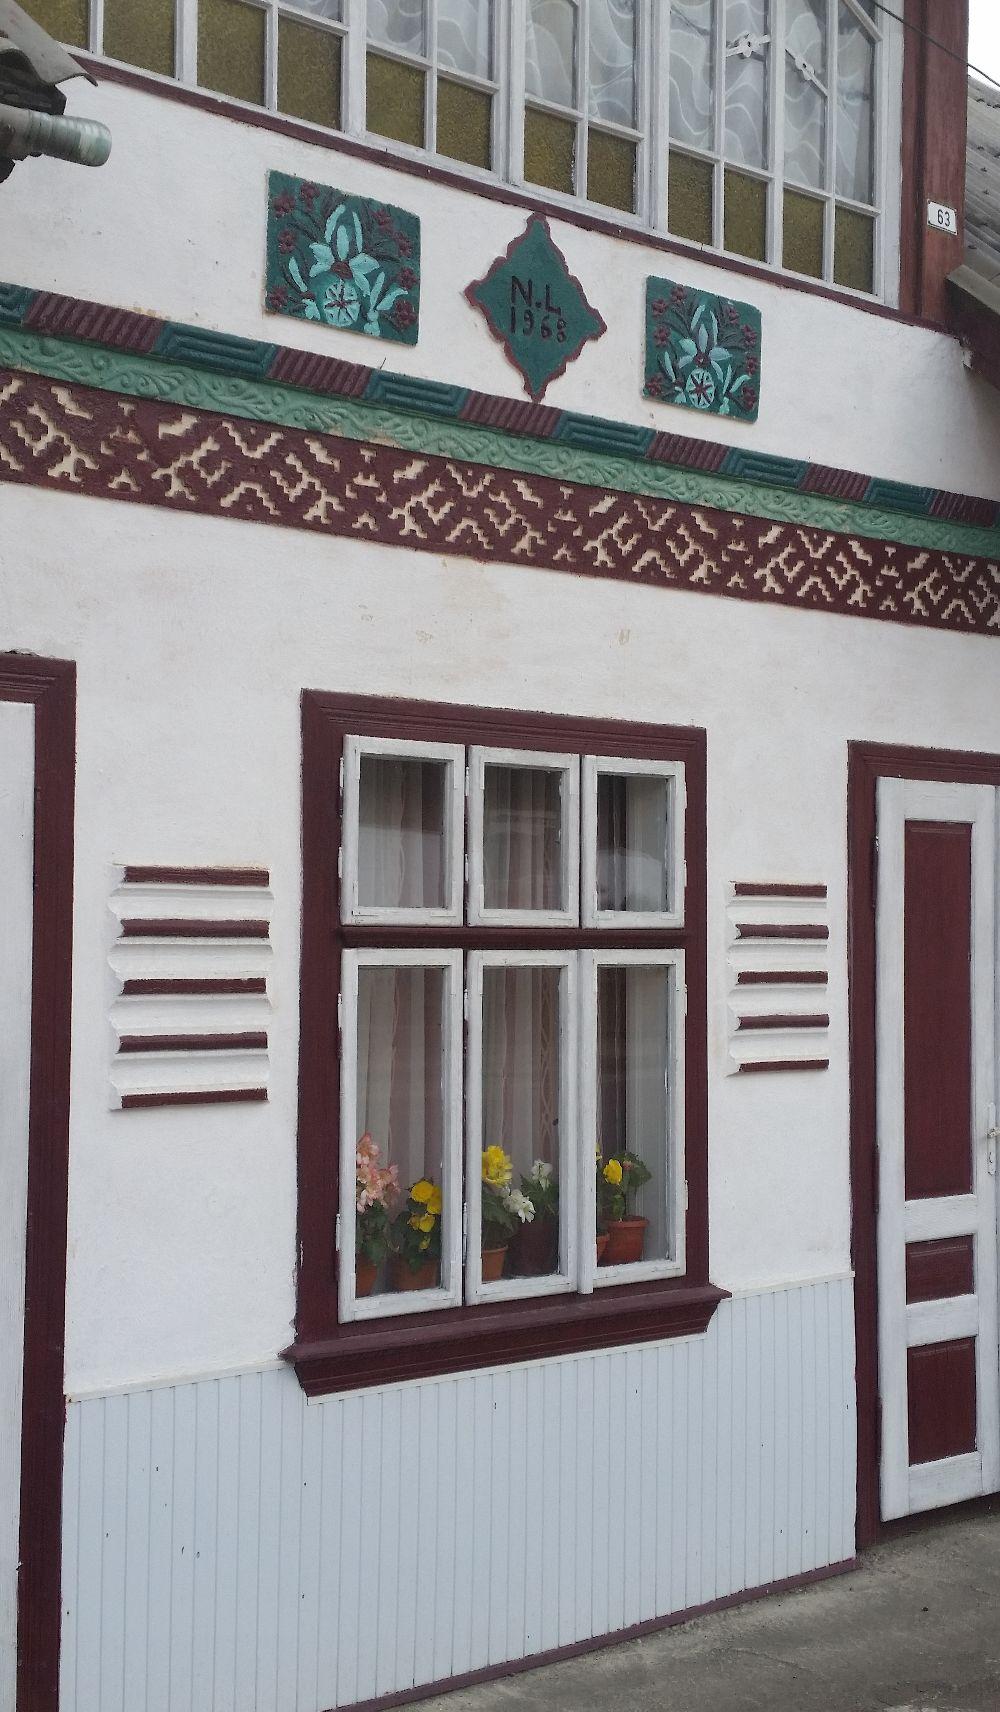 adelaparvu.com despre Ciocanesti, case cu motive traditionale, Bucovina, Romania (32)